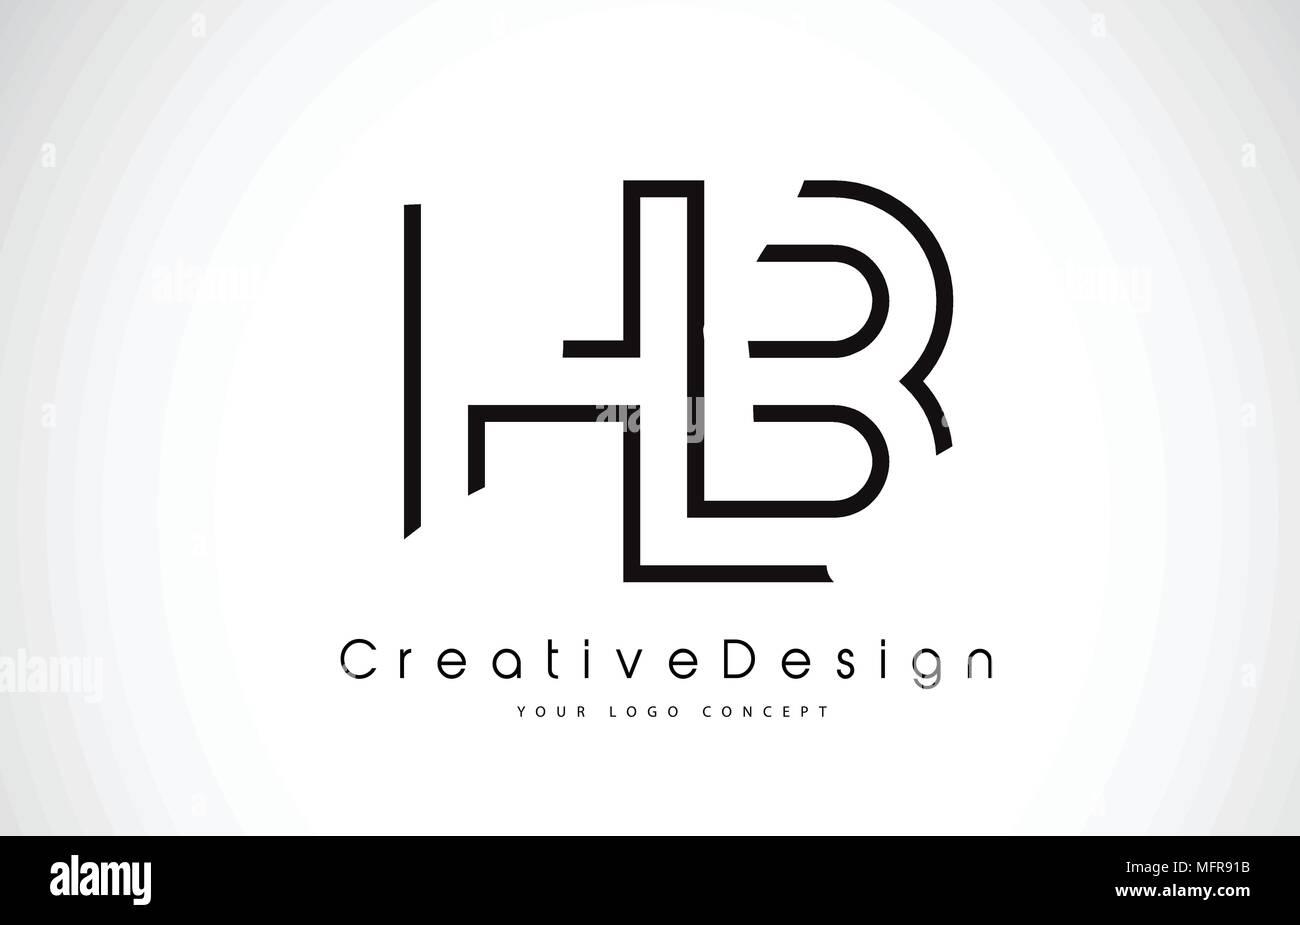 hb h b letter logo design in black colors creative modern letters